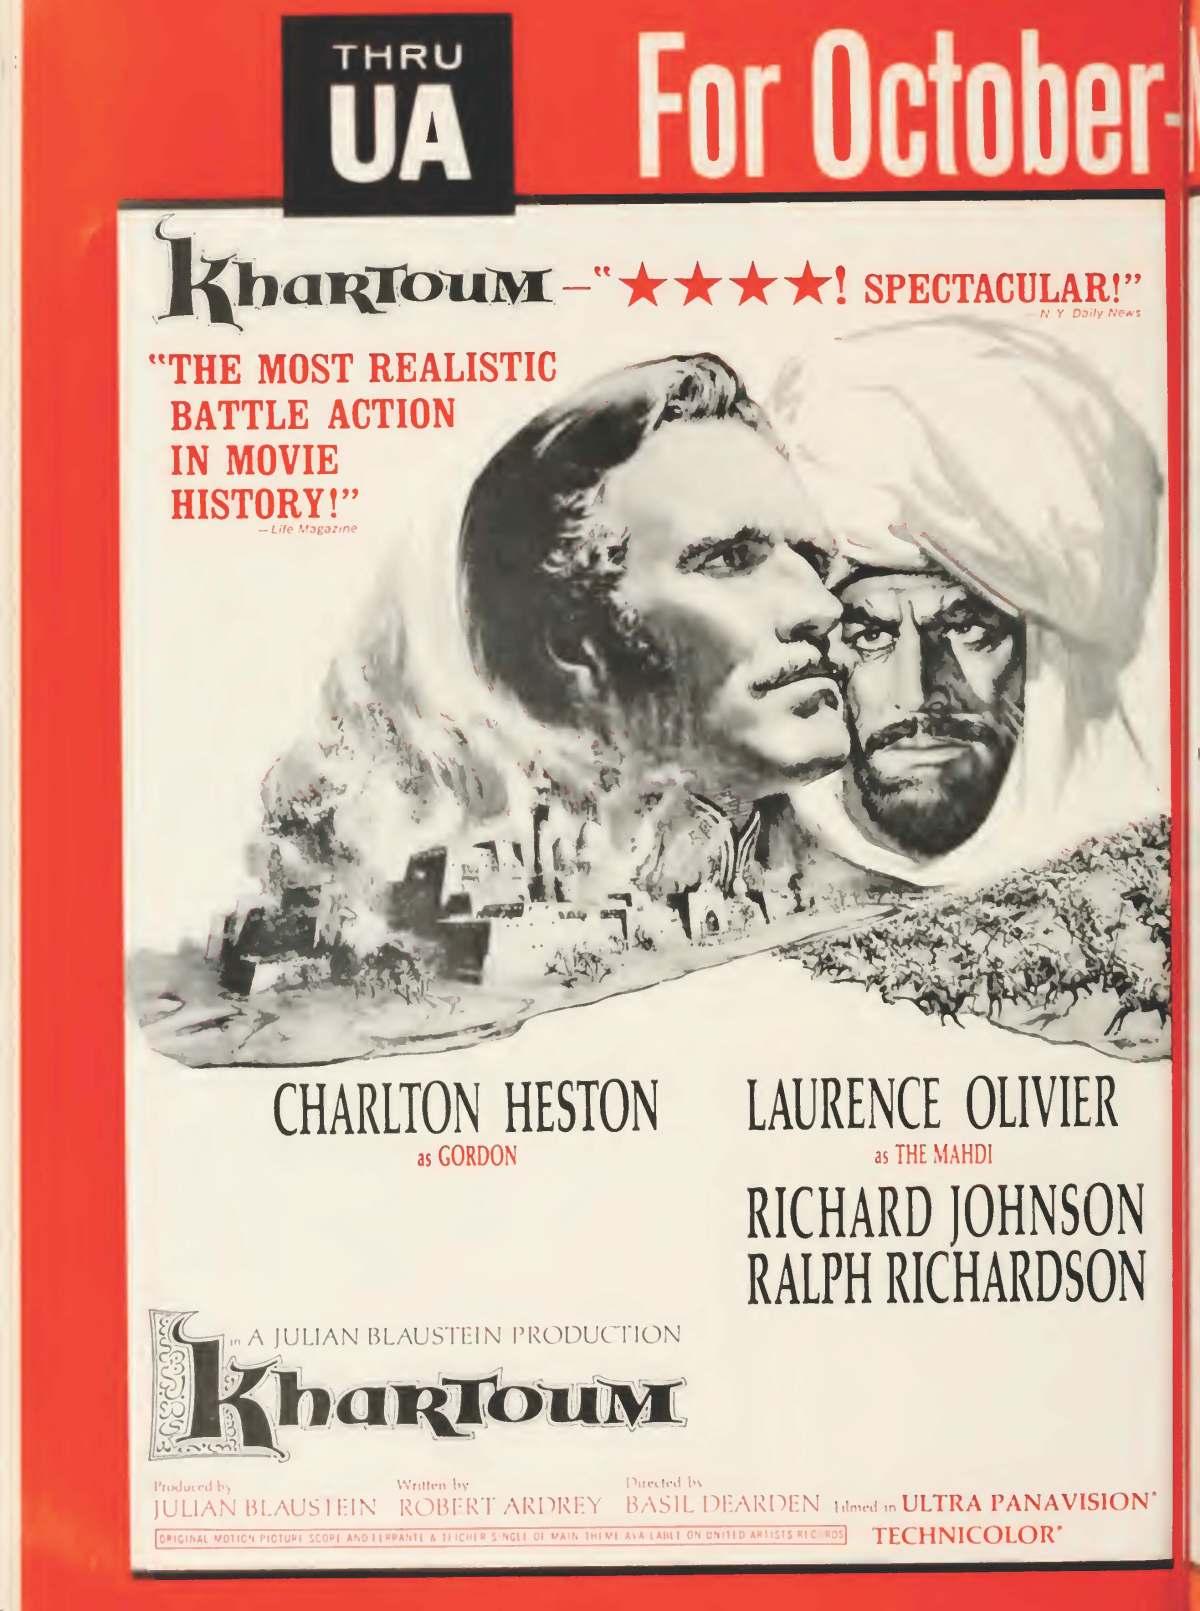 Khartoum (1966) ****